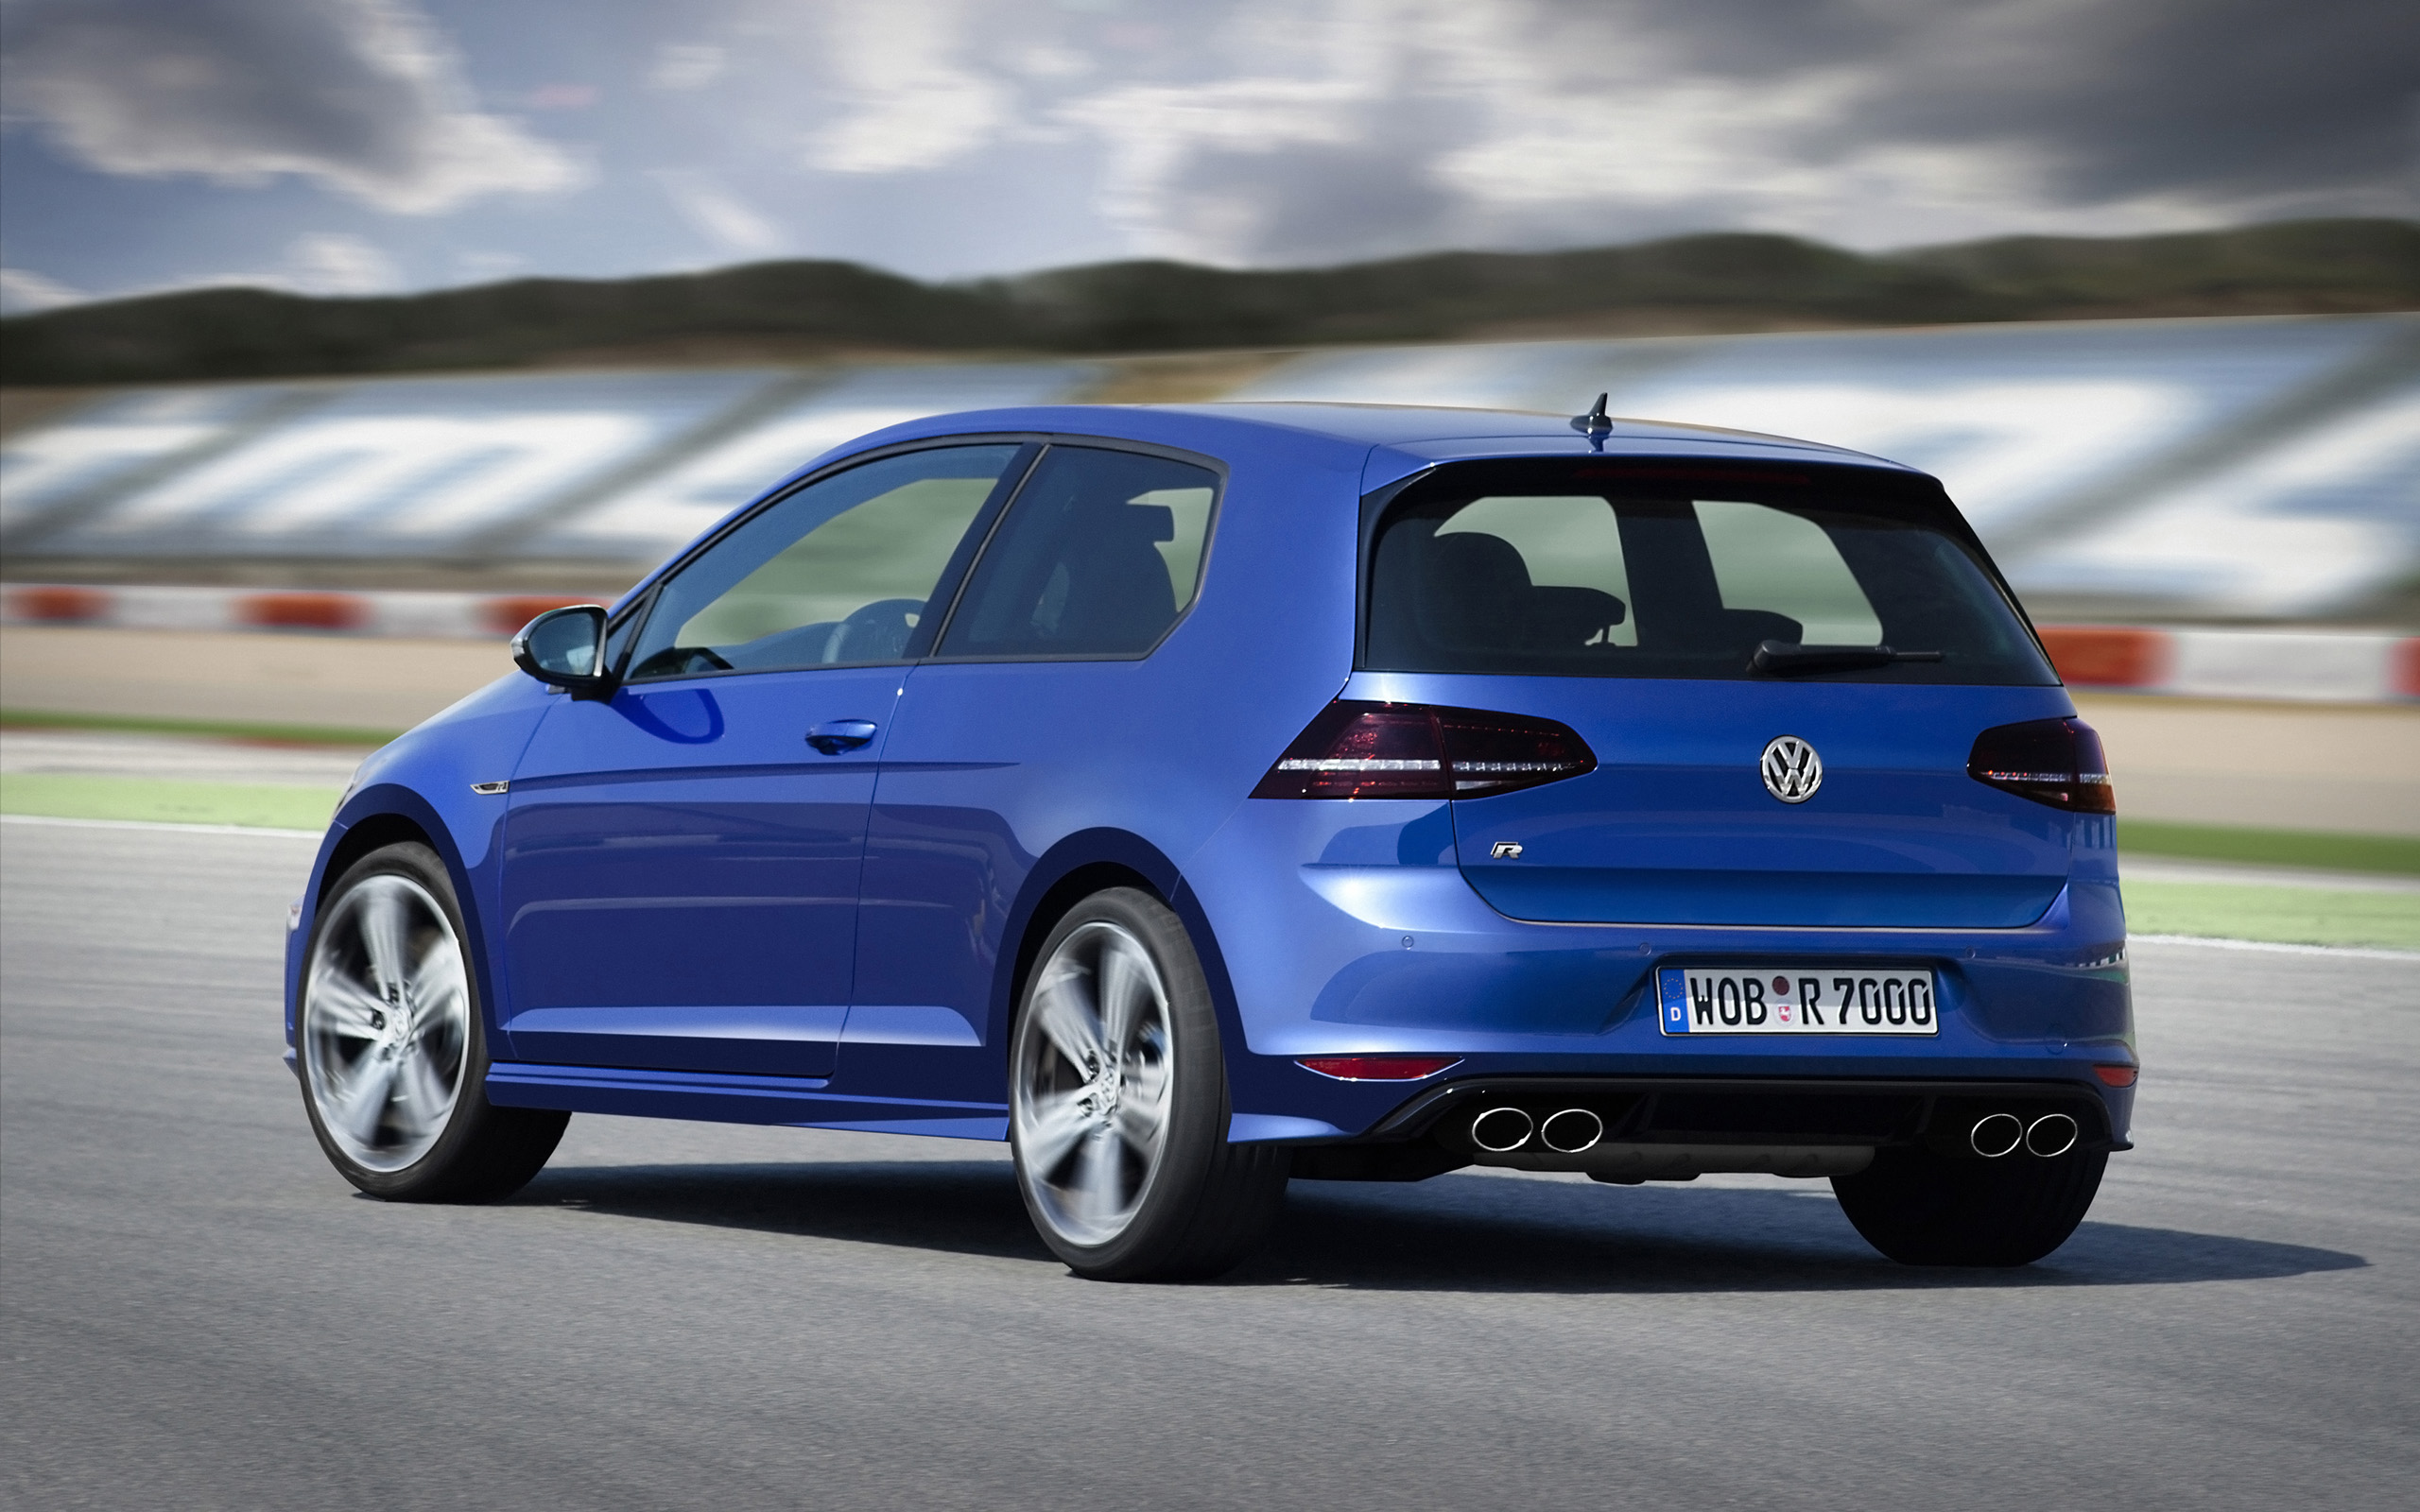 2014 Volkswagen Golf R   Motion   7   2560x1600   Wallpaper 2560x1600